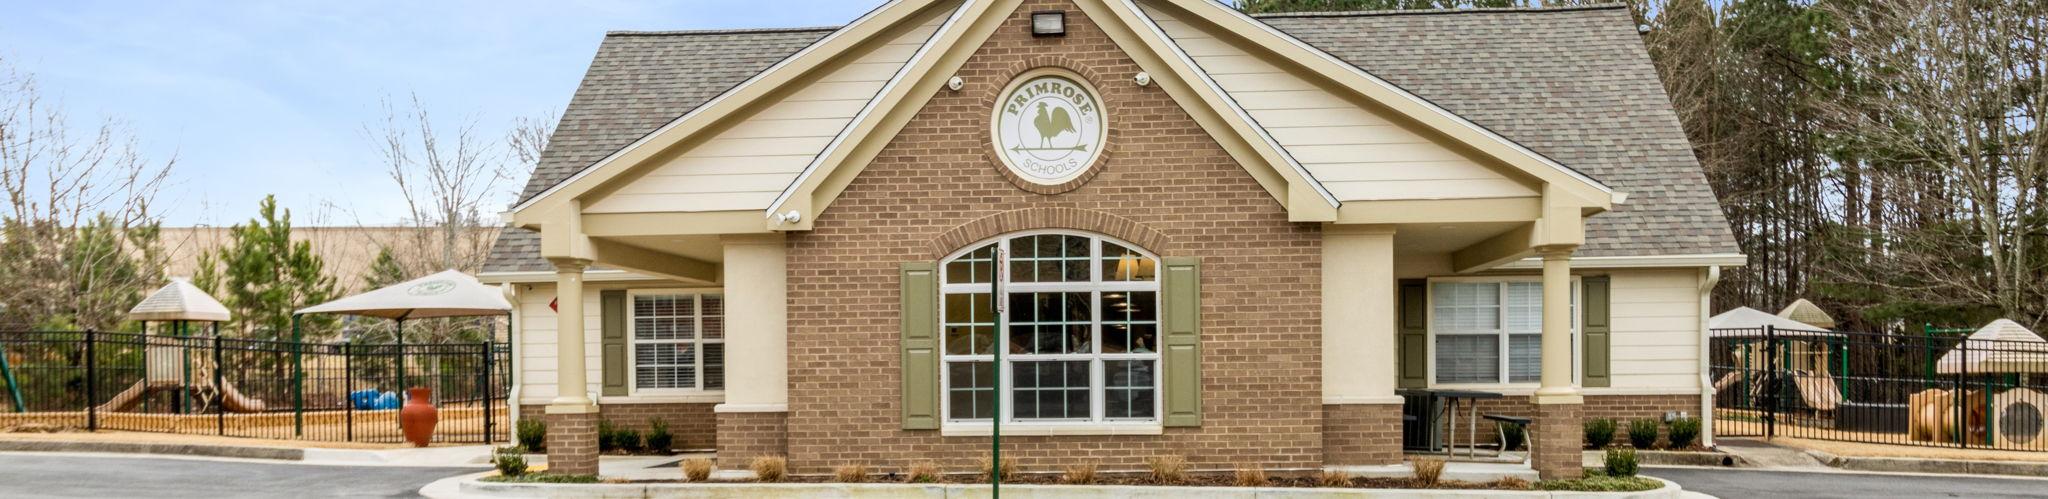 Exterior of a Primrose School at Macland Pointe